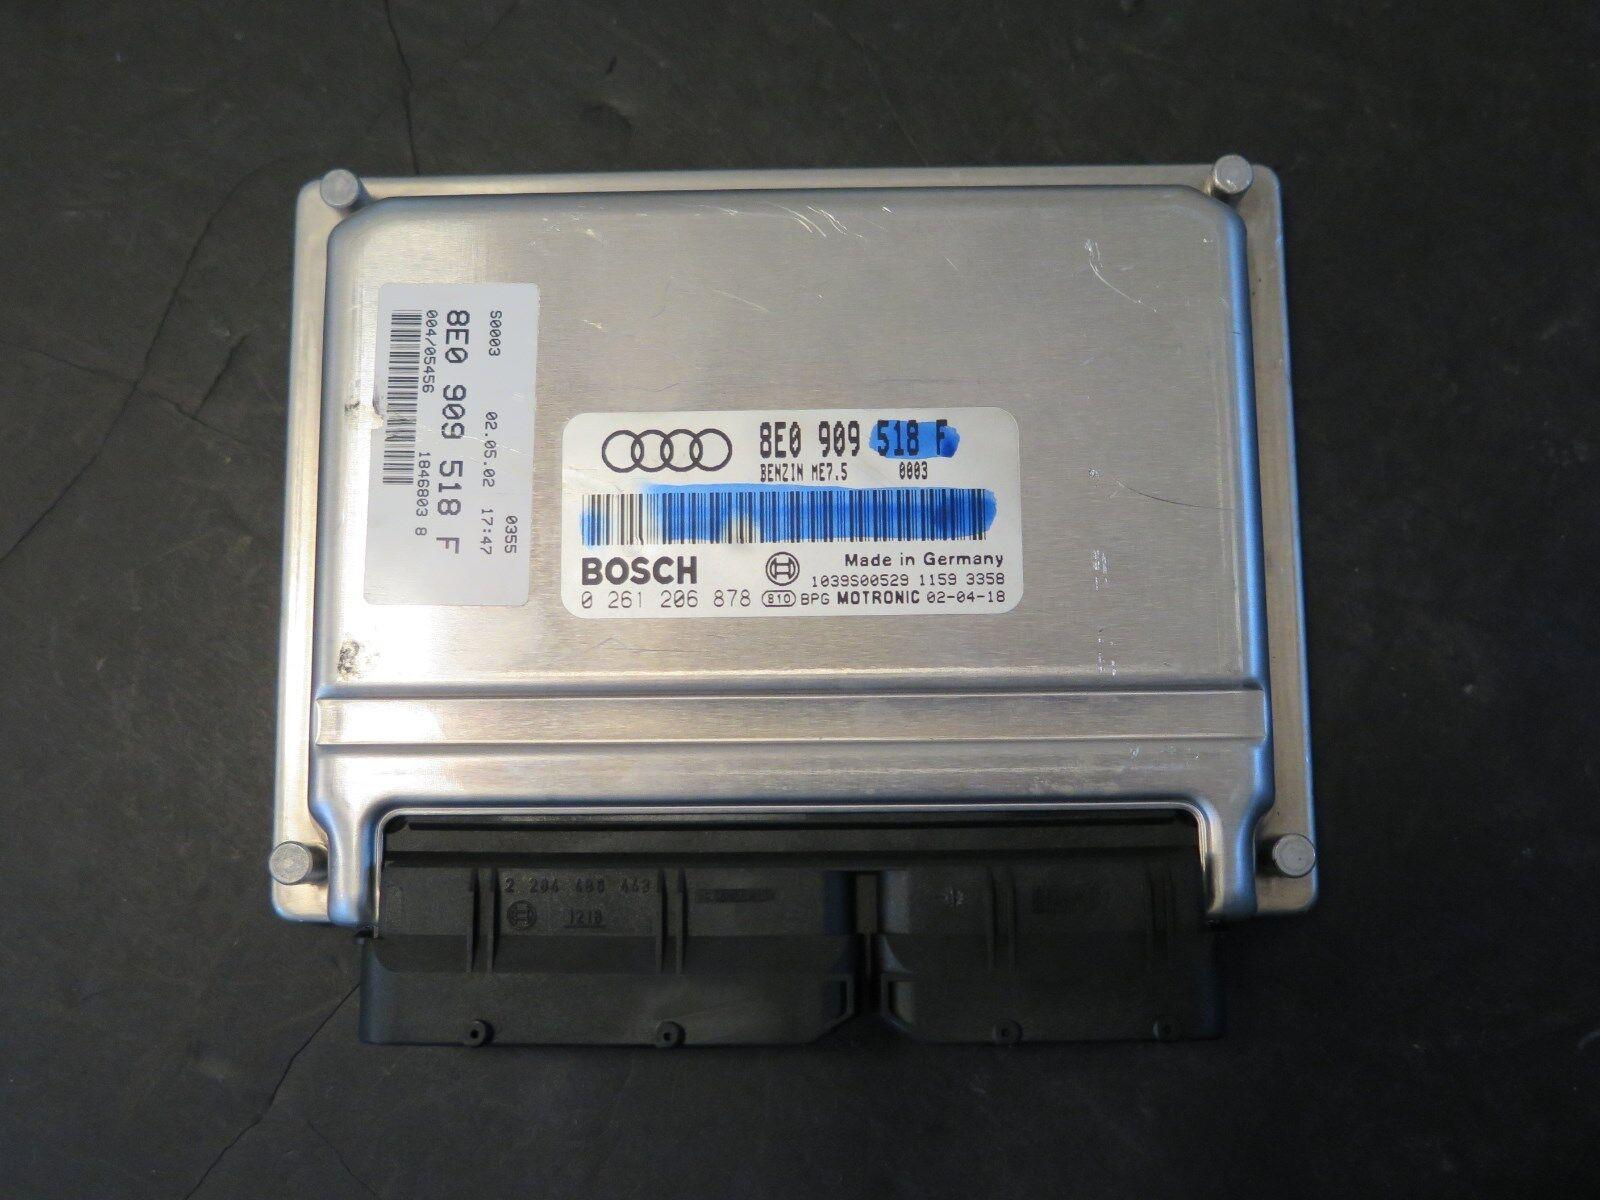 03 Audi A4 18 Turbo Ecm Ecu Engine Control Computer Bosch 2003 Wiring Harness 2002 2004 18t 8e0 909 518 F